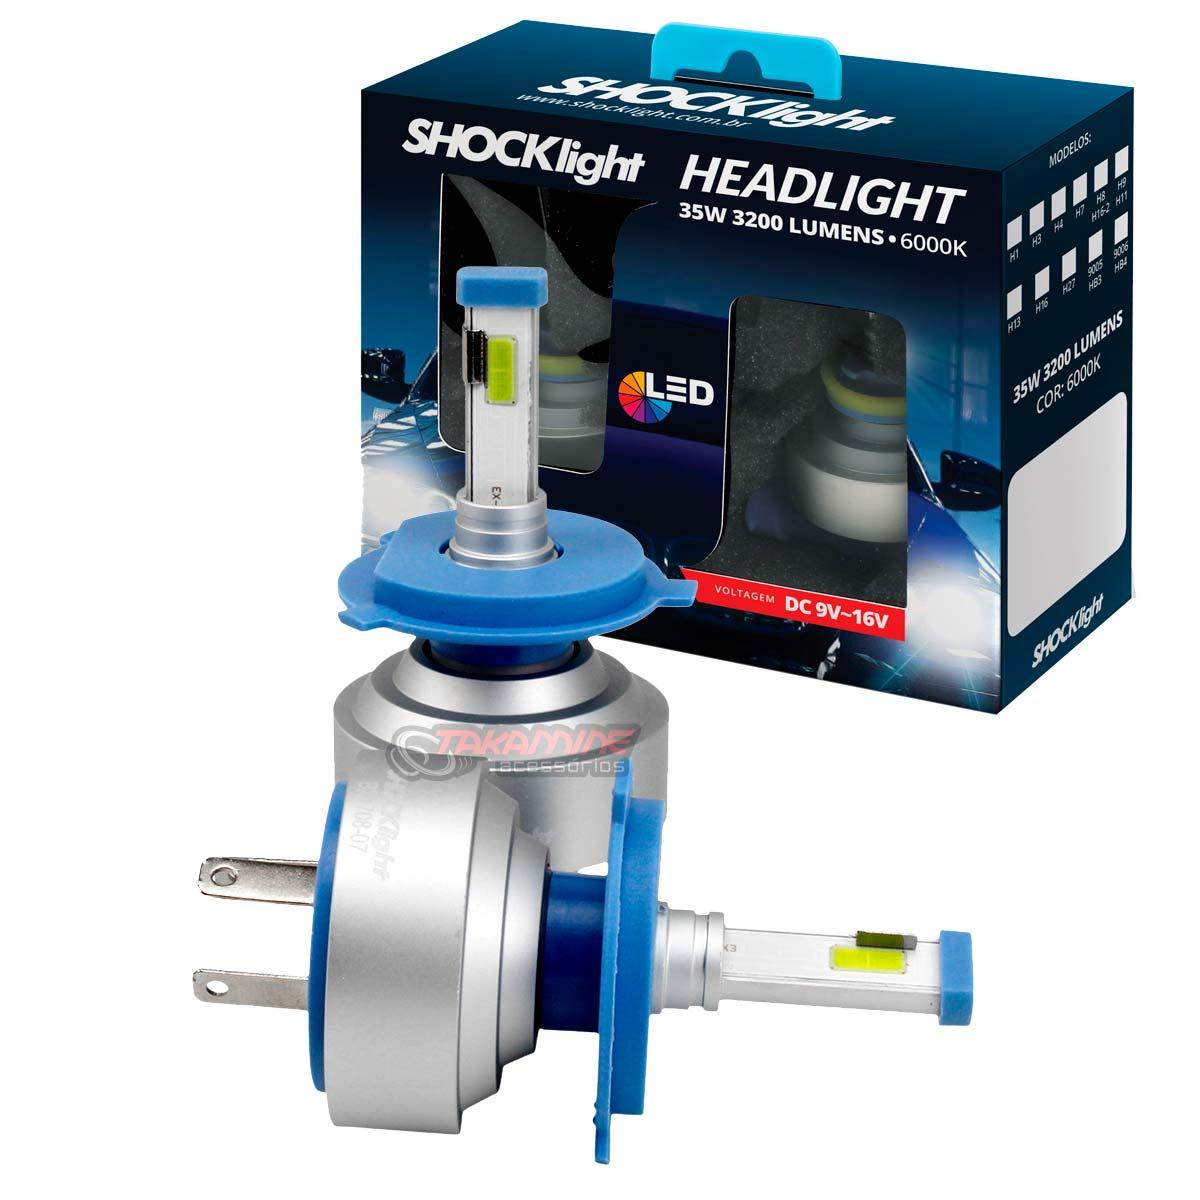 Kit LED Kwid 2017 2018 2019 2020 tipo xenon modelo H4 35W encaixe original plug & play New Headlight